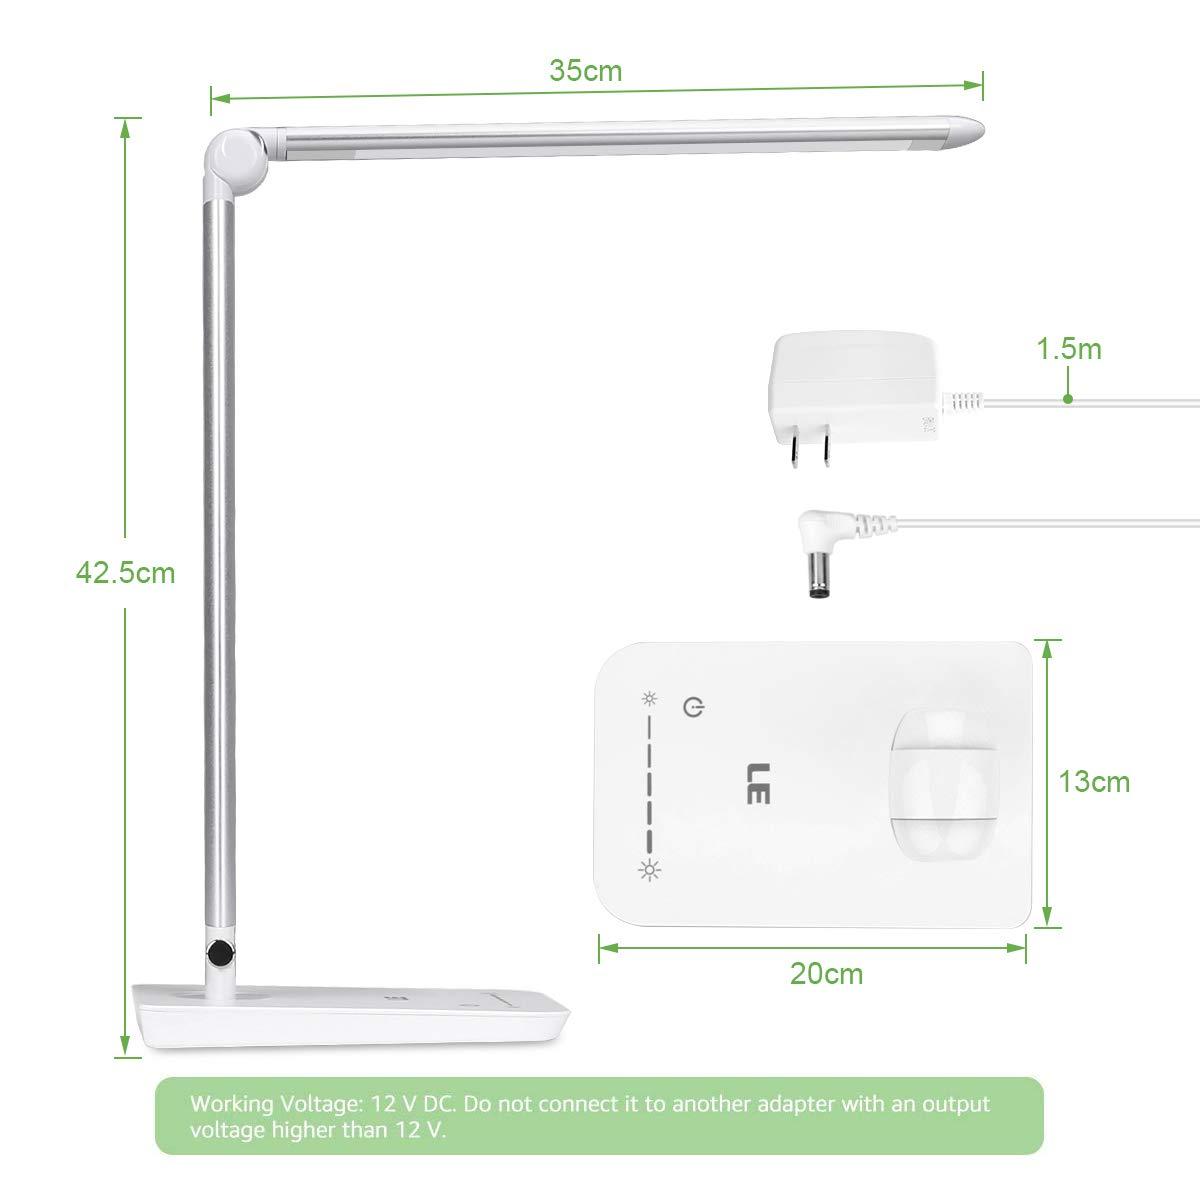 1 Pack Lighting EVER 3100017-DW-US High intensity 7-Level Brightness Adjustable LED Desk Lamp Silver White